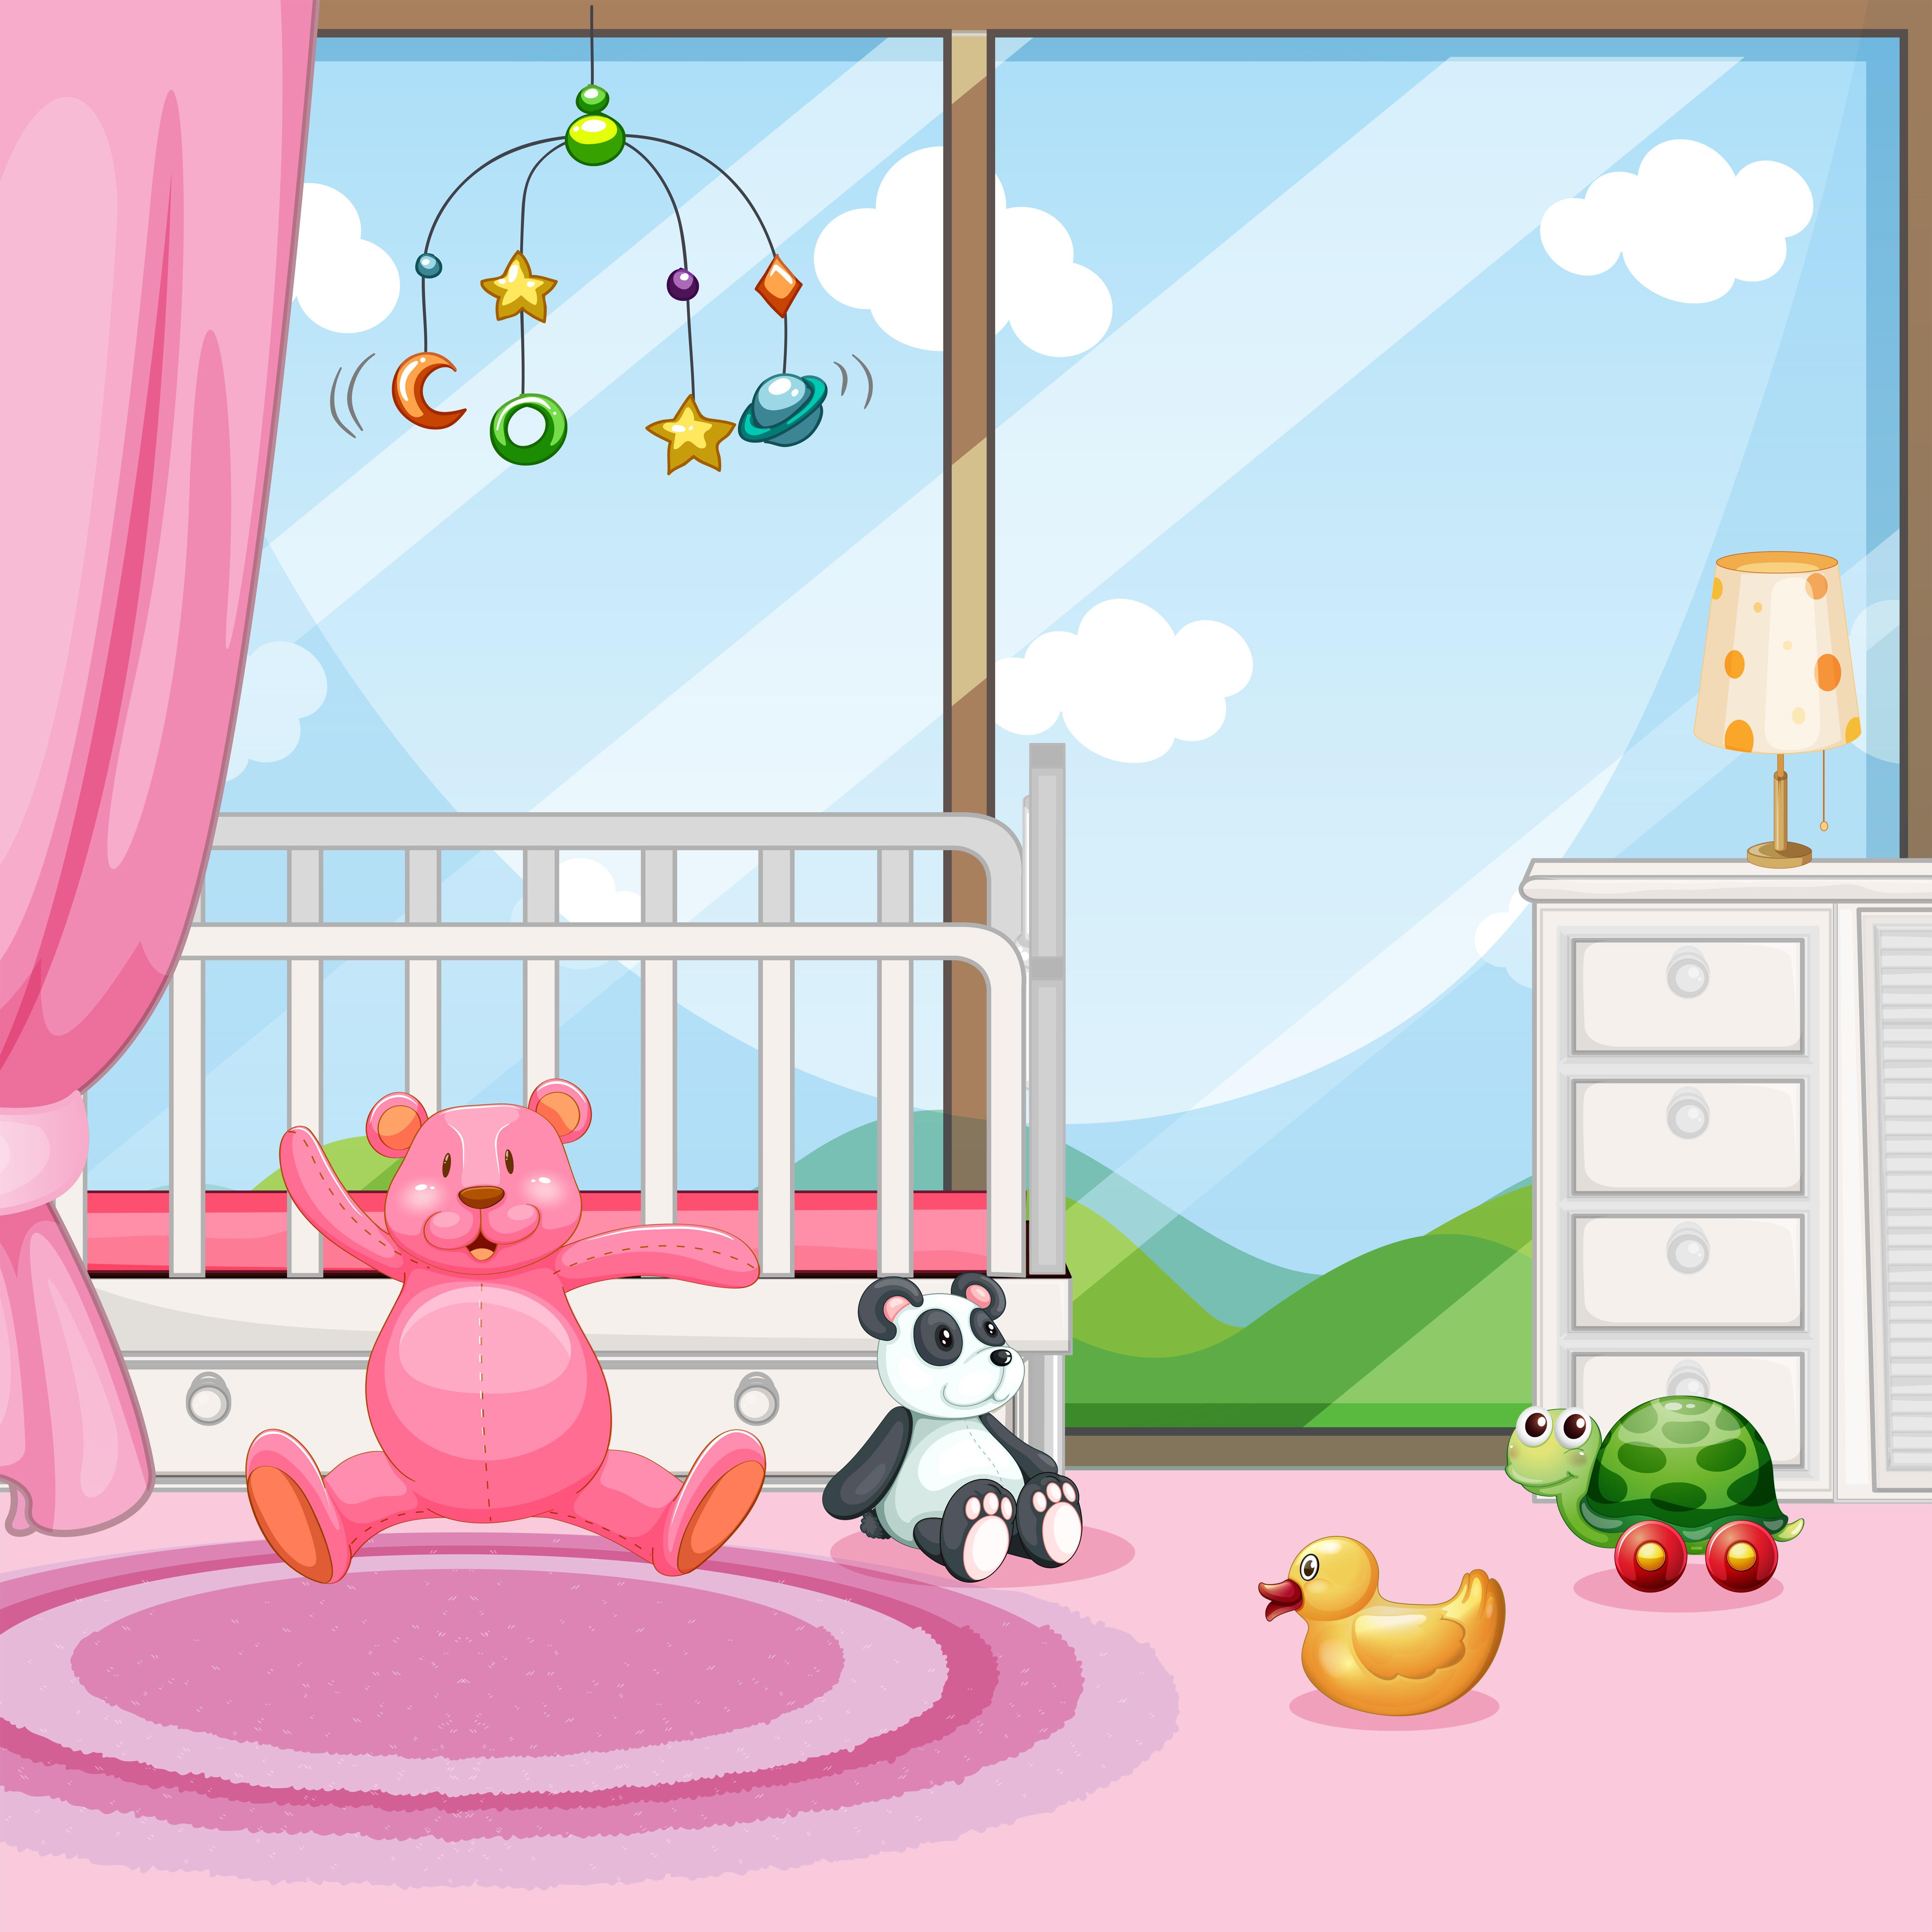 Bedroom Clip Art: Bedroom Scene With Babycot And Dolls